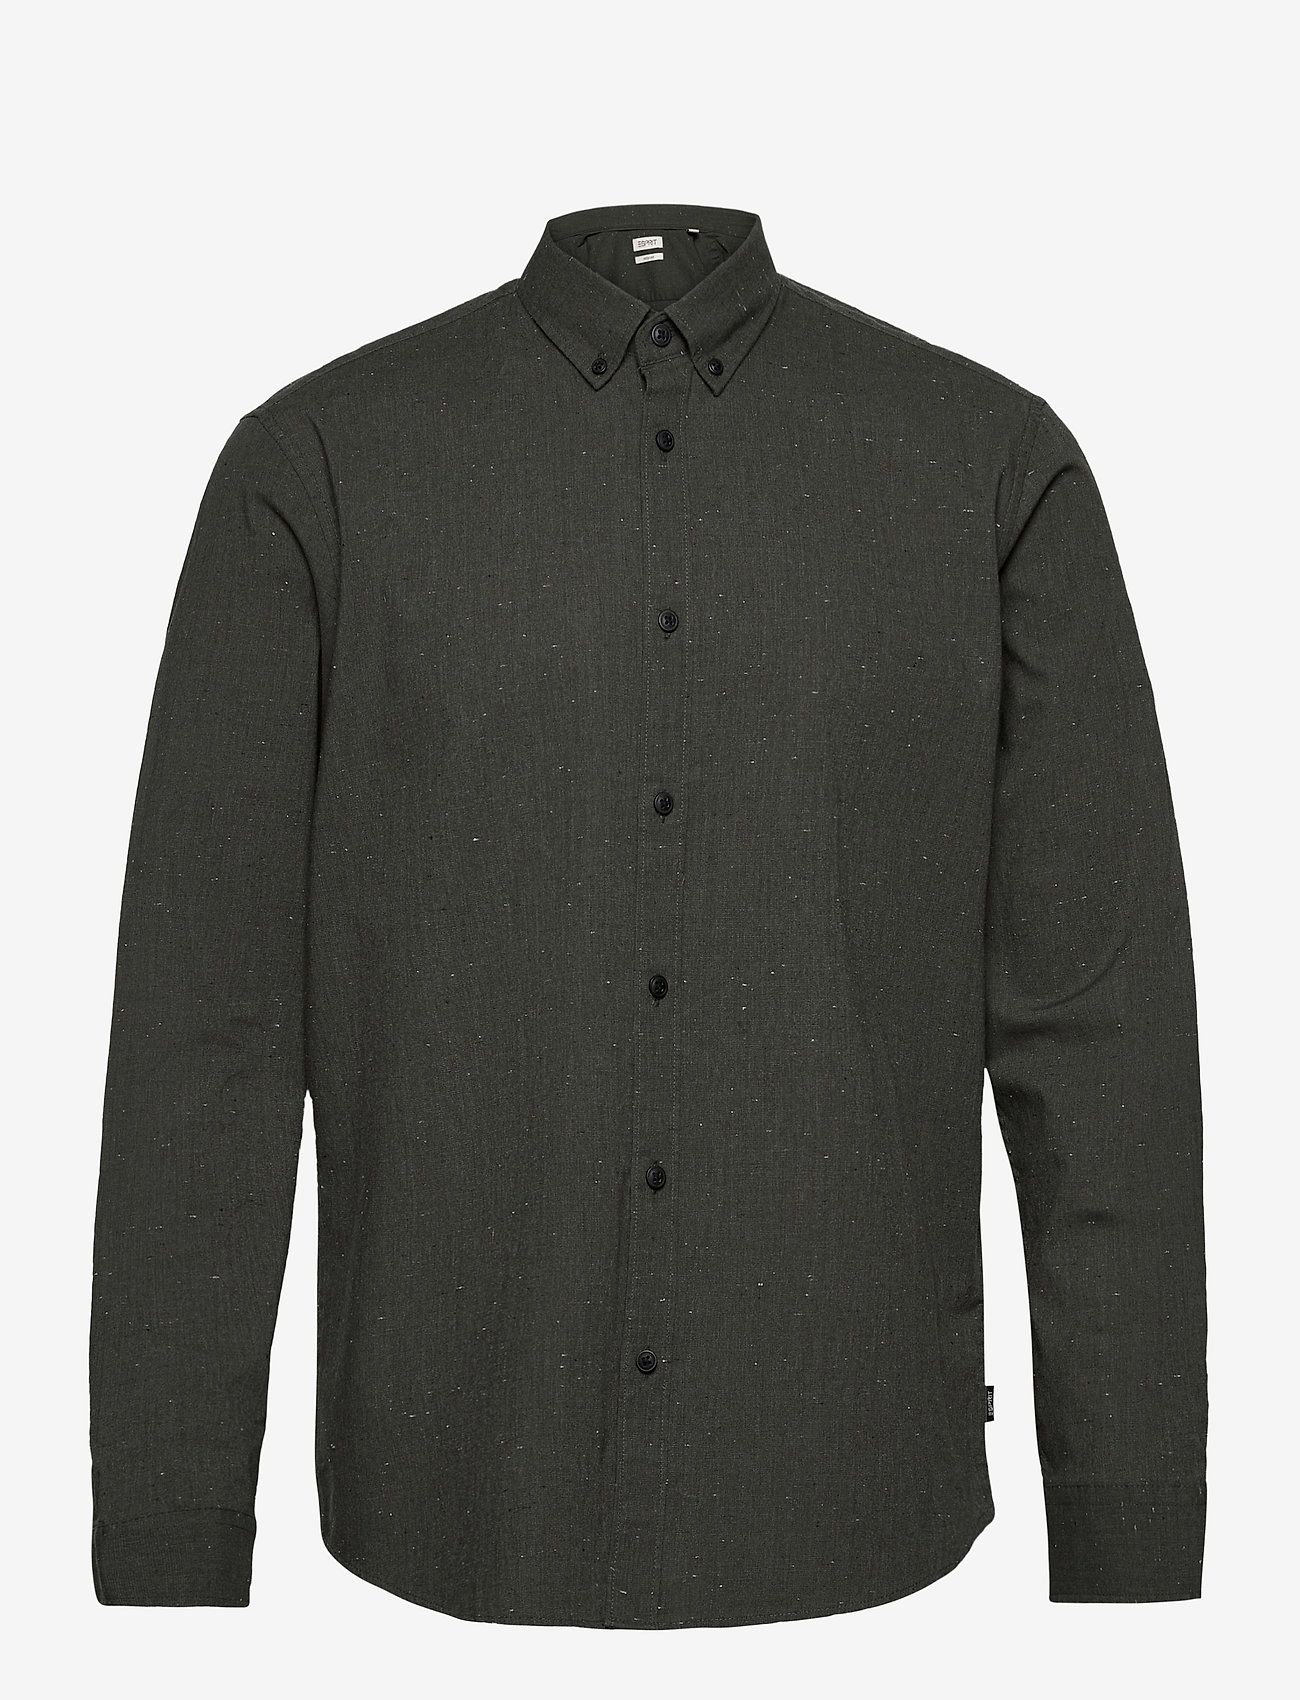 Esprit Casual - Shirts woven - chemises basiques - dark khaki 5 - 0